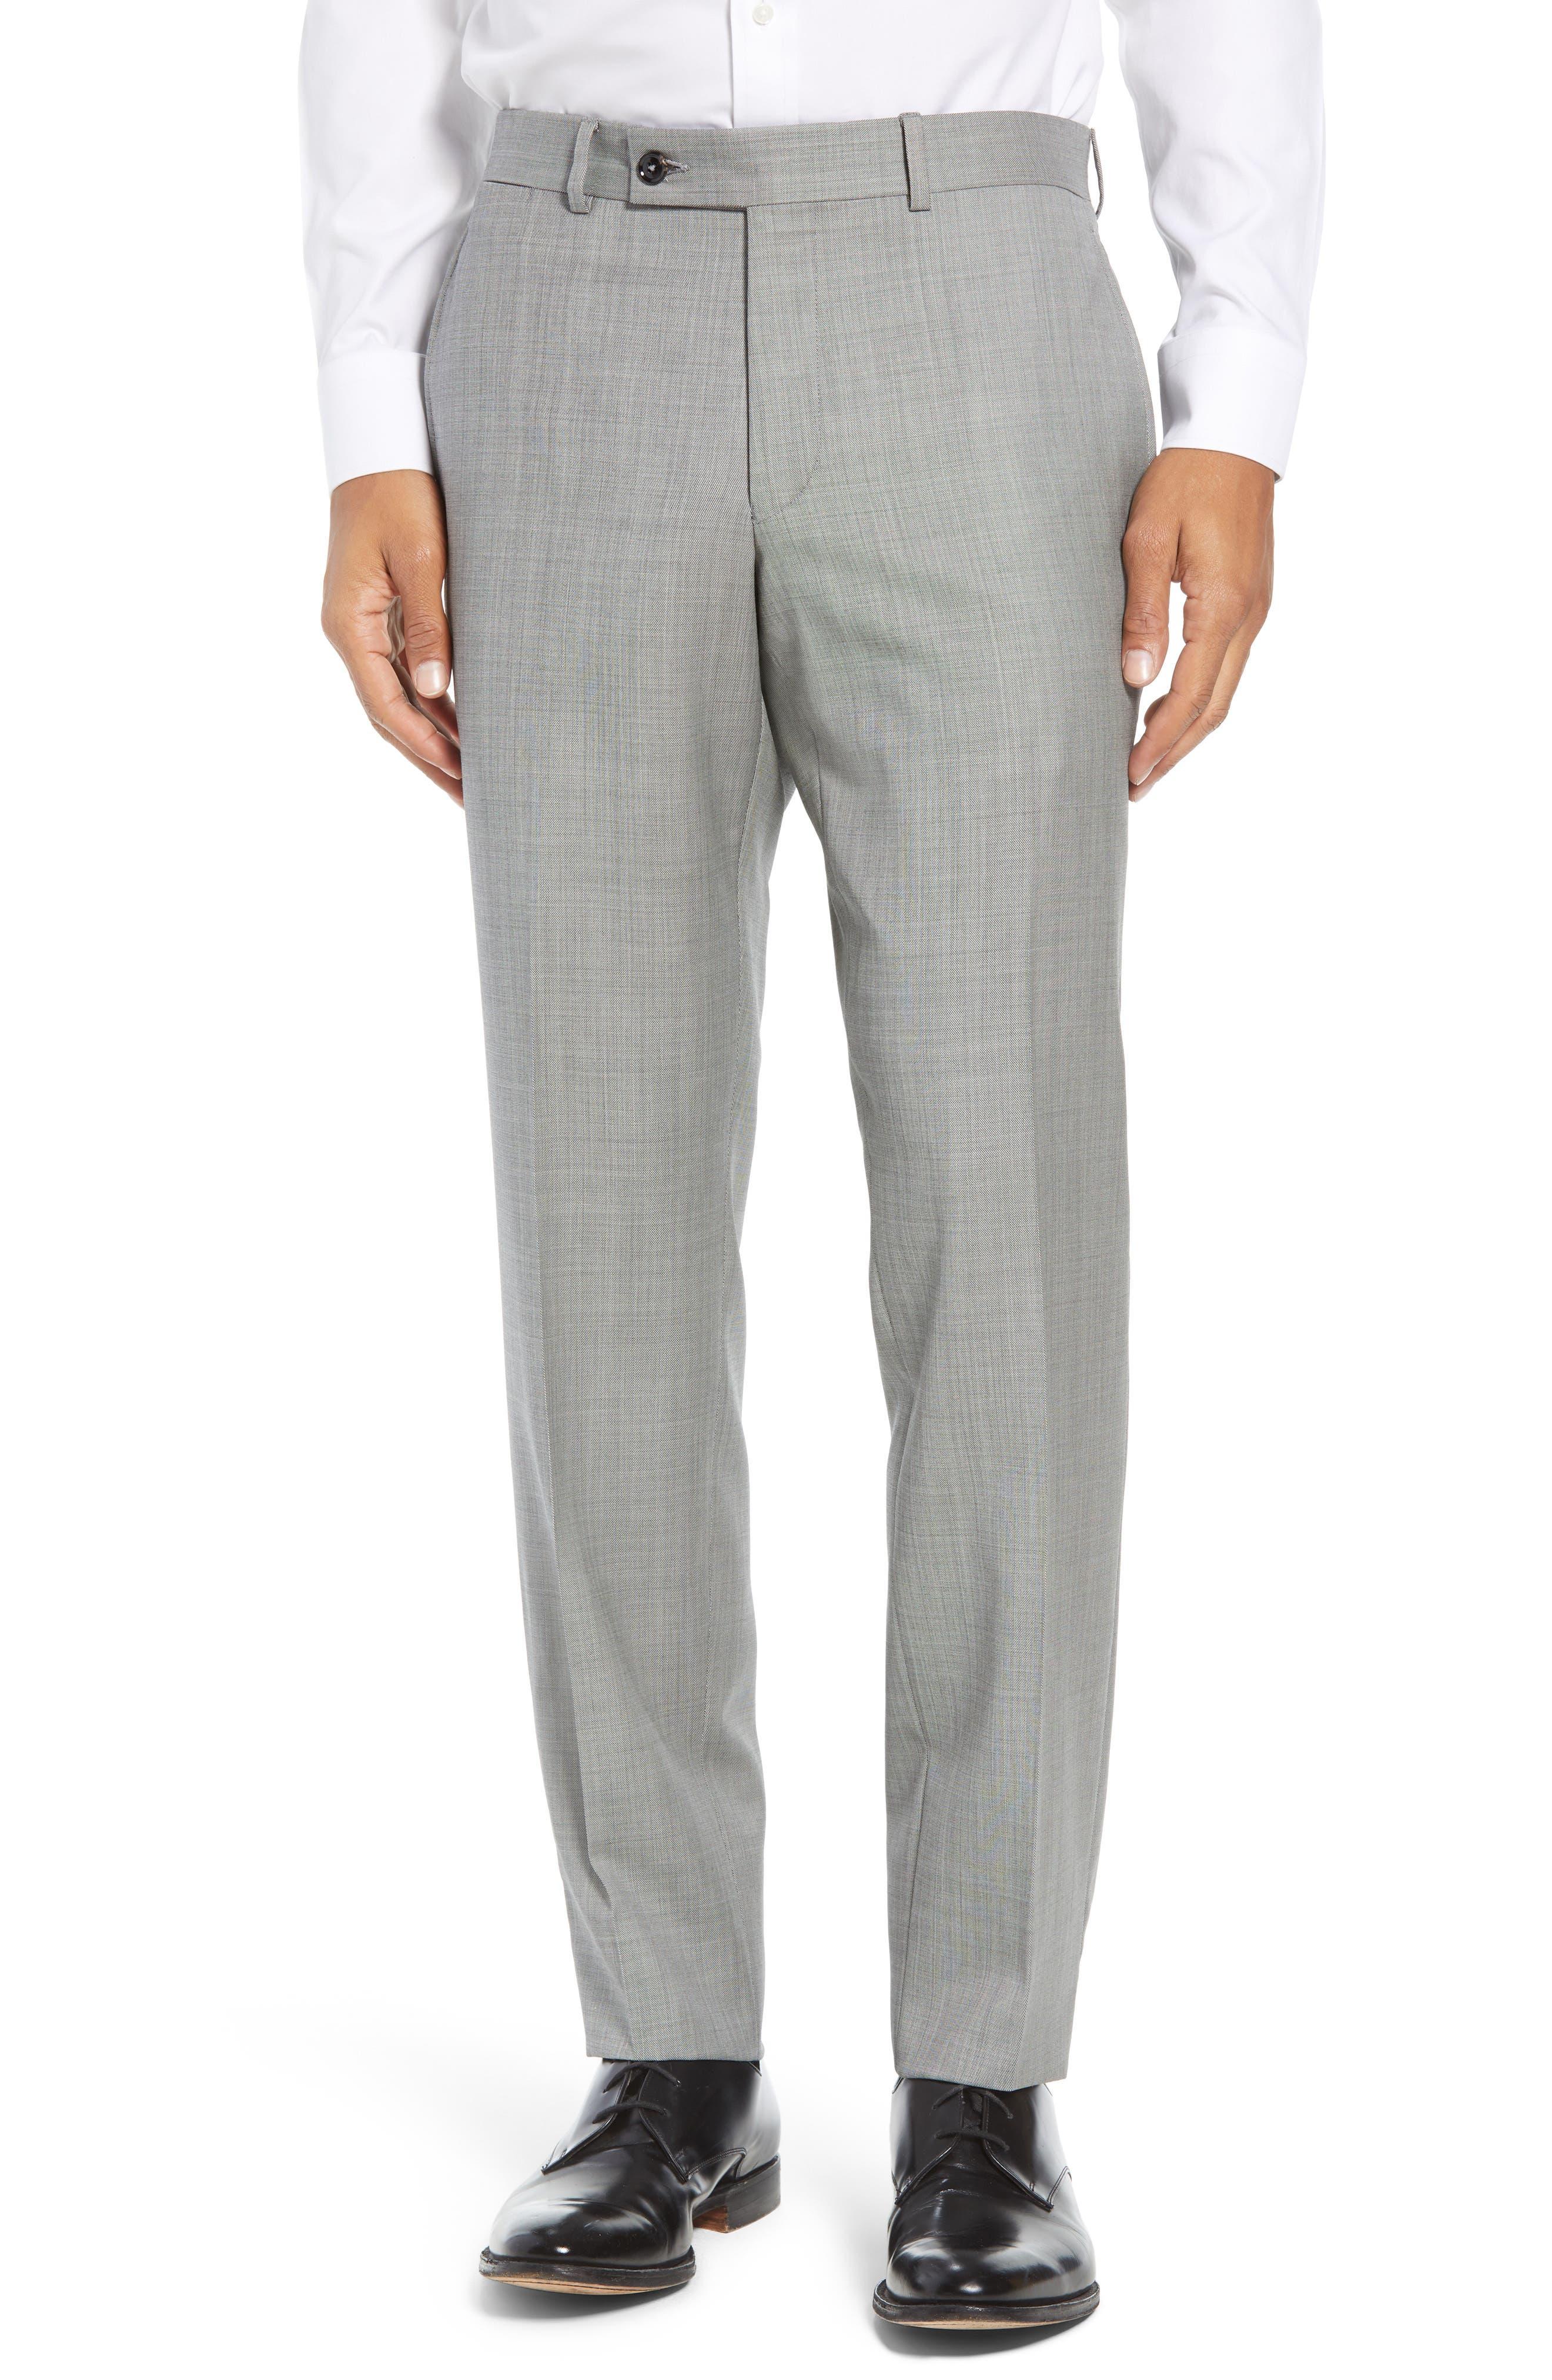 Jay Trim Fit Solid Wool Suit,                             Alternate thumbnail 6, color,                             LIGHT GREY